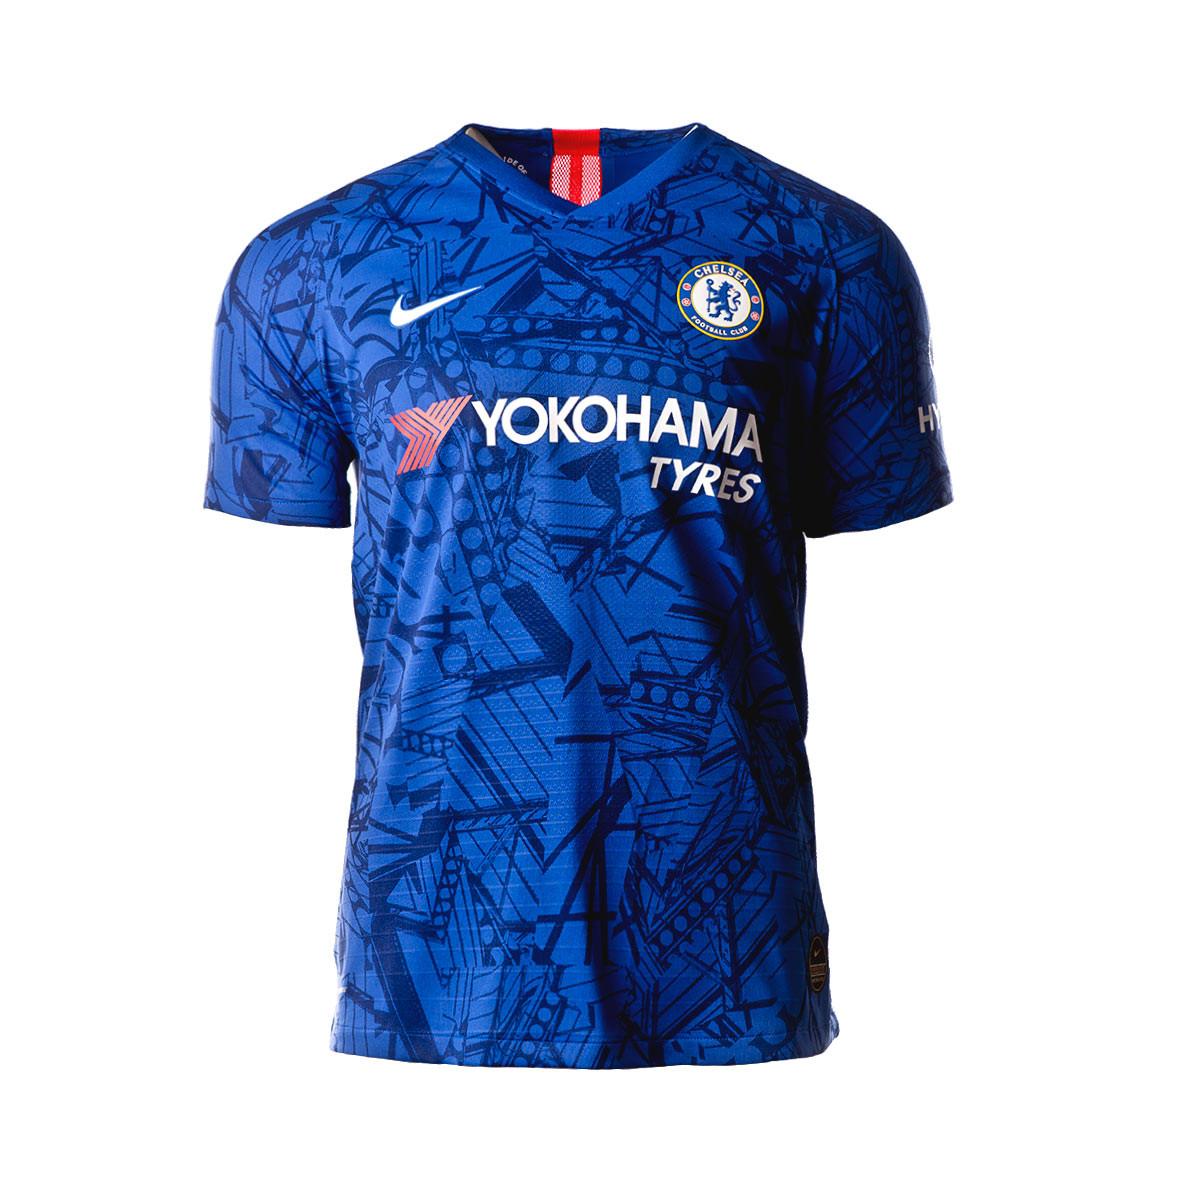 wholesale dealer 6d8e1 c6557 Camiseta Chelsea FC Vapor Match SS Primera Equipación 2019-2020 Rush  blue-White